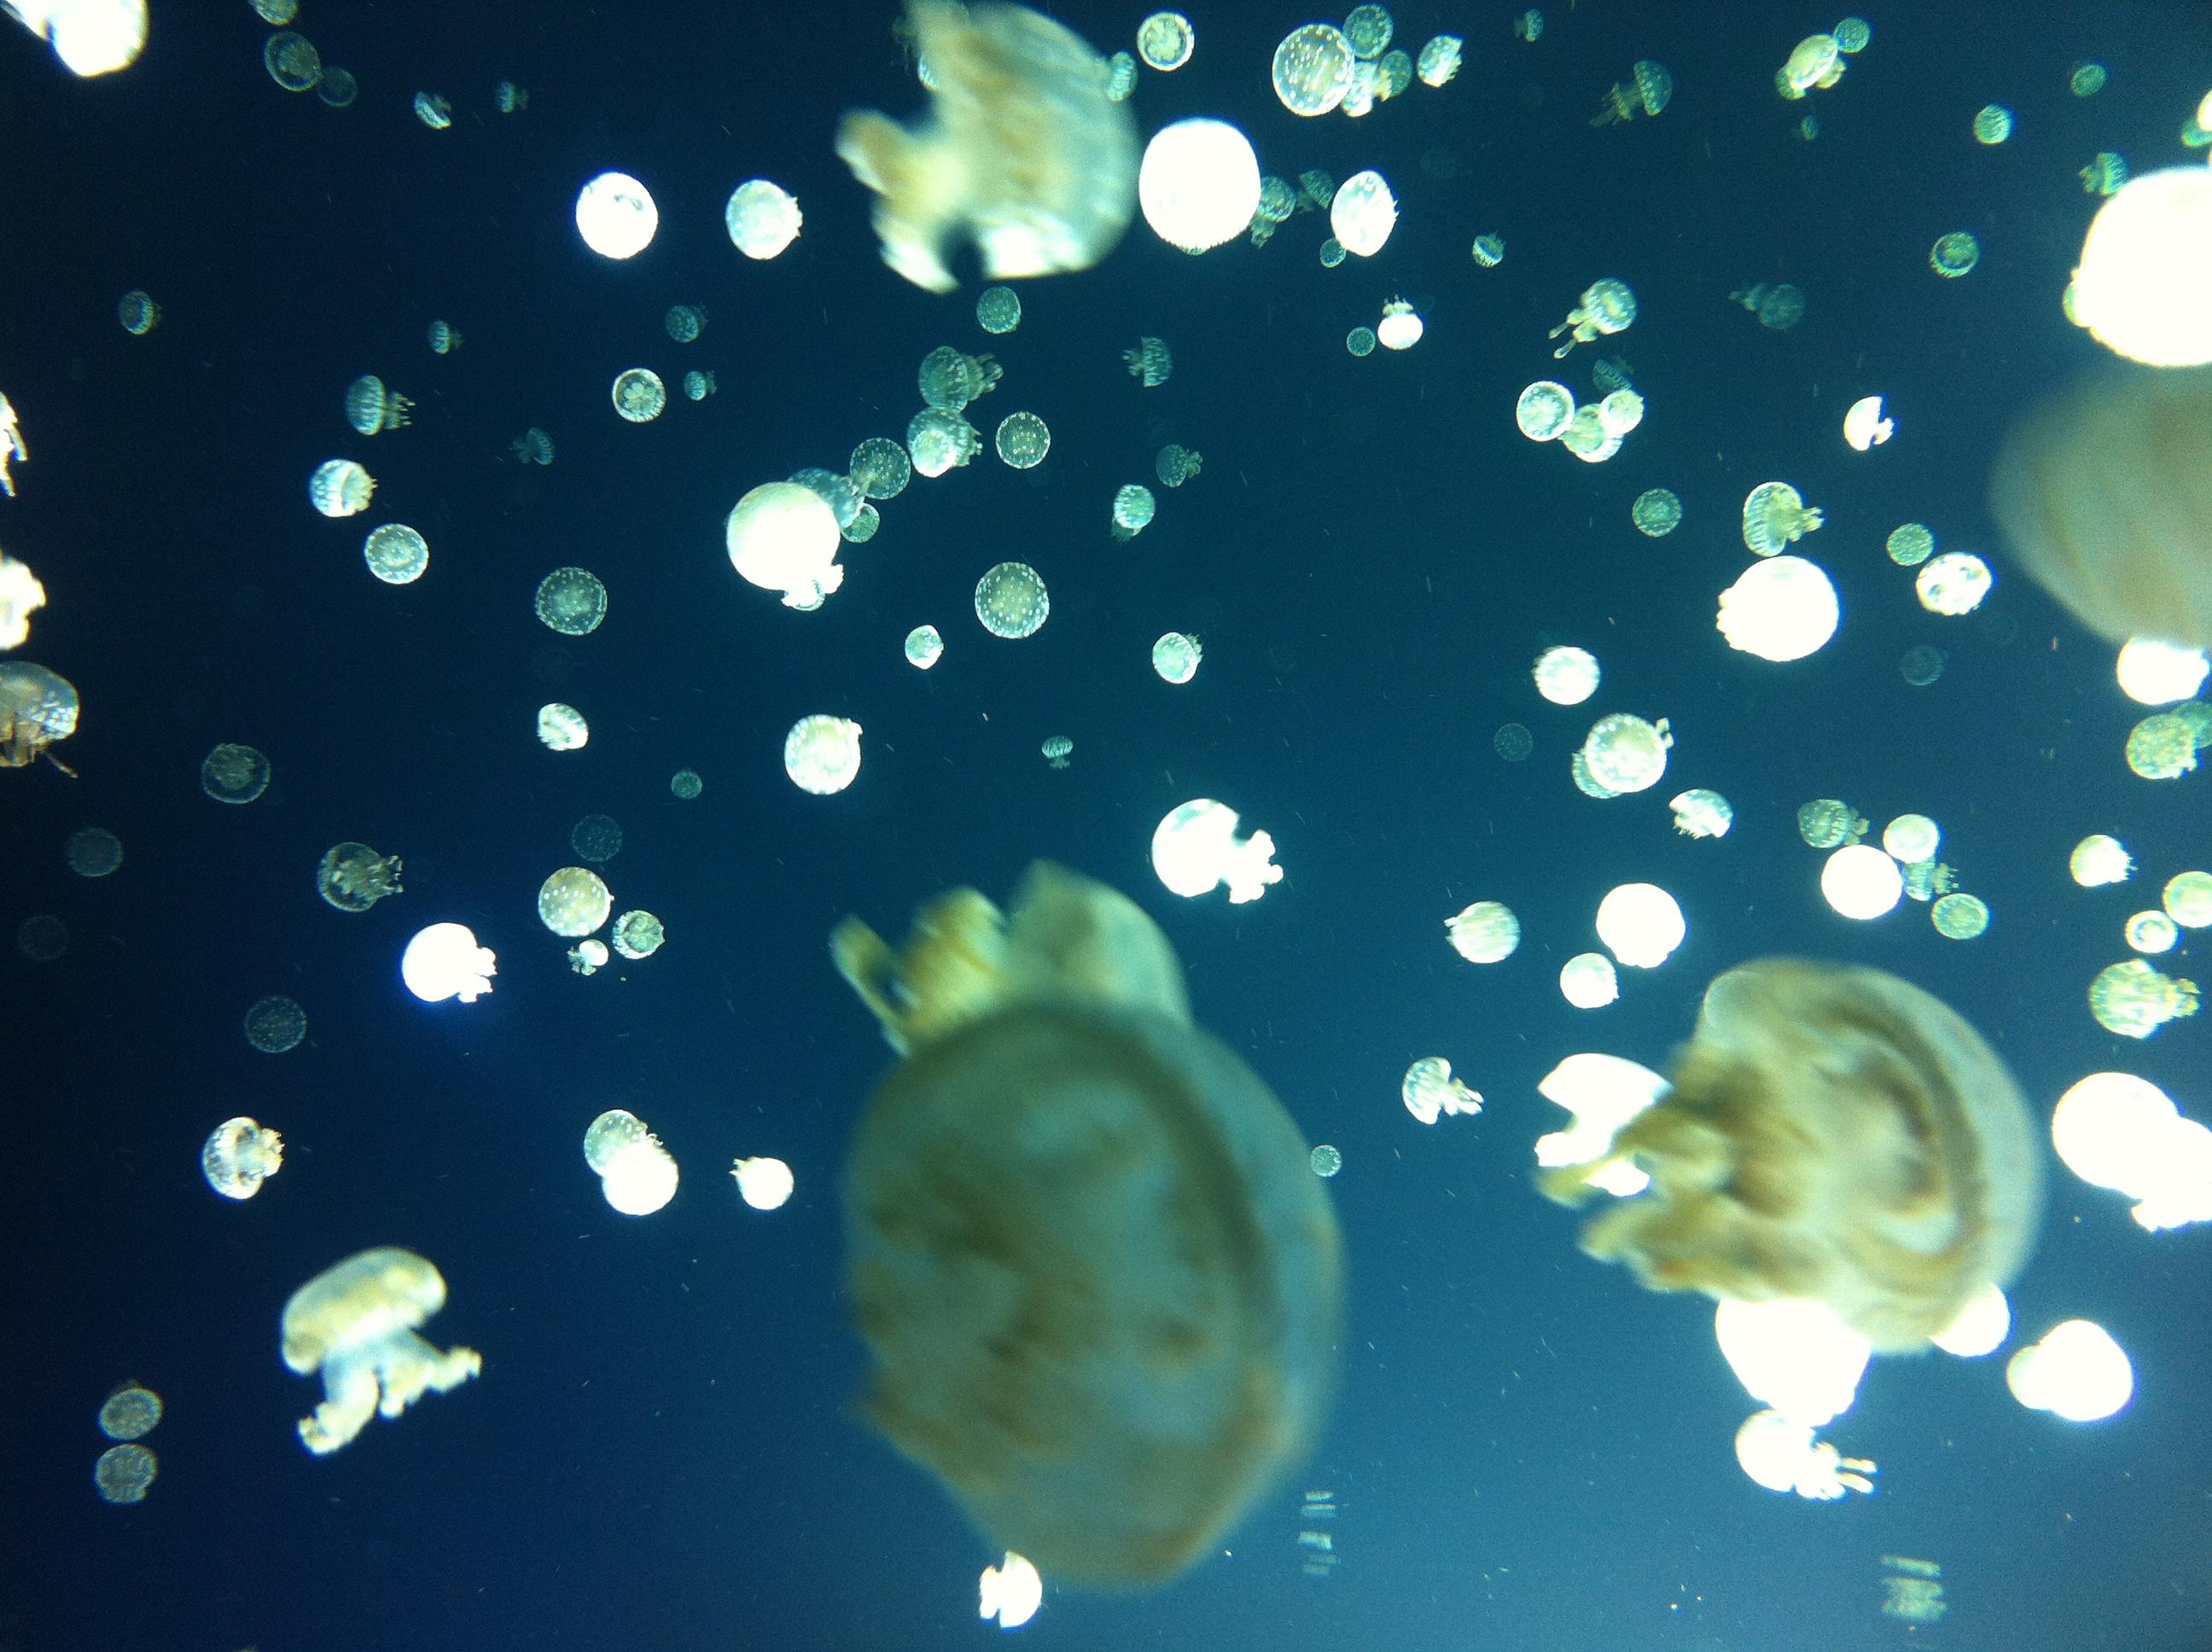 looking to nature for inspiration - toronto aquarium